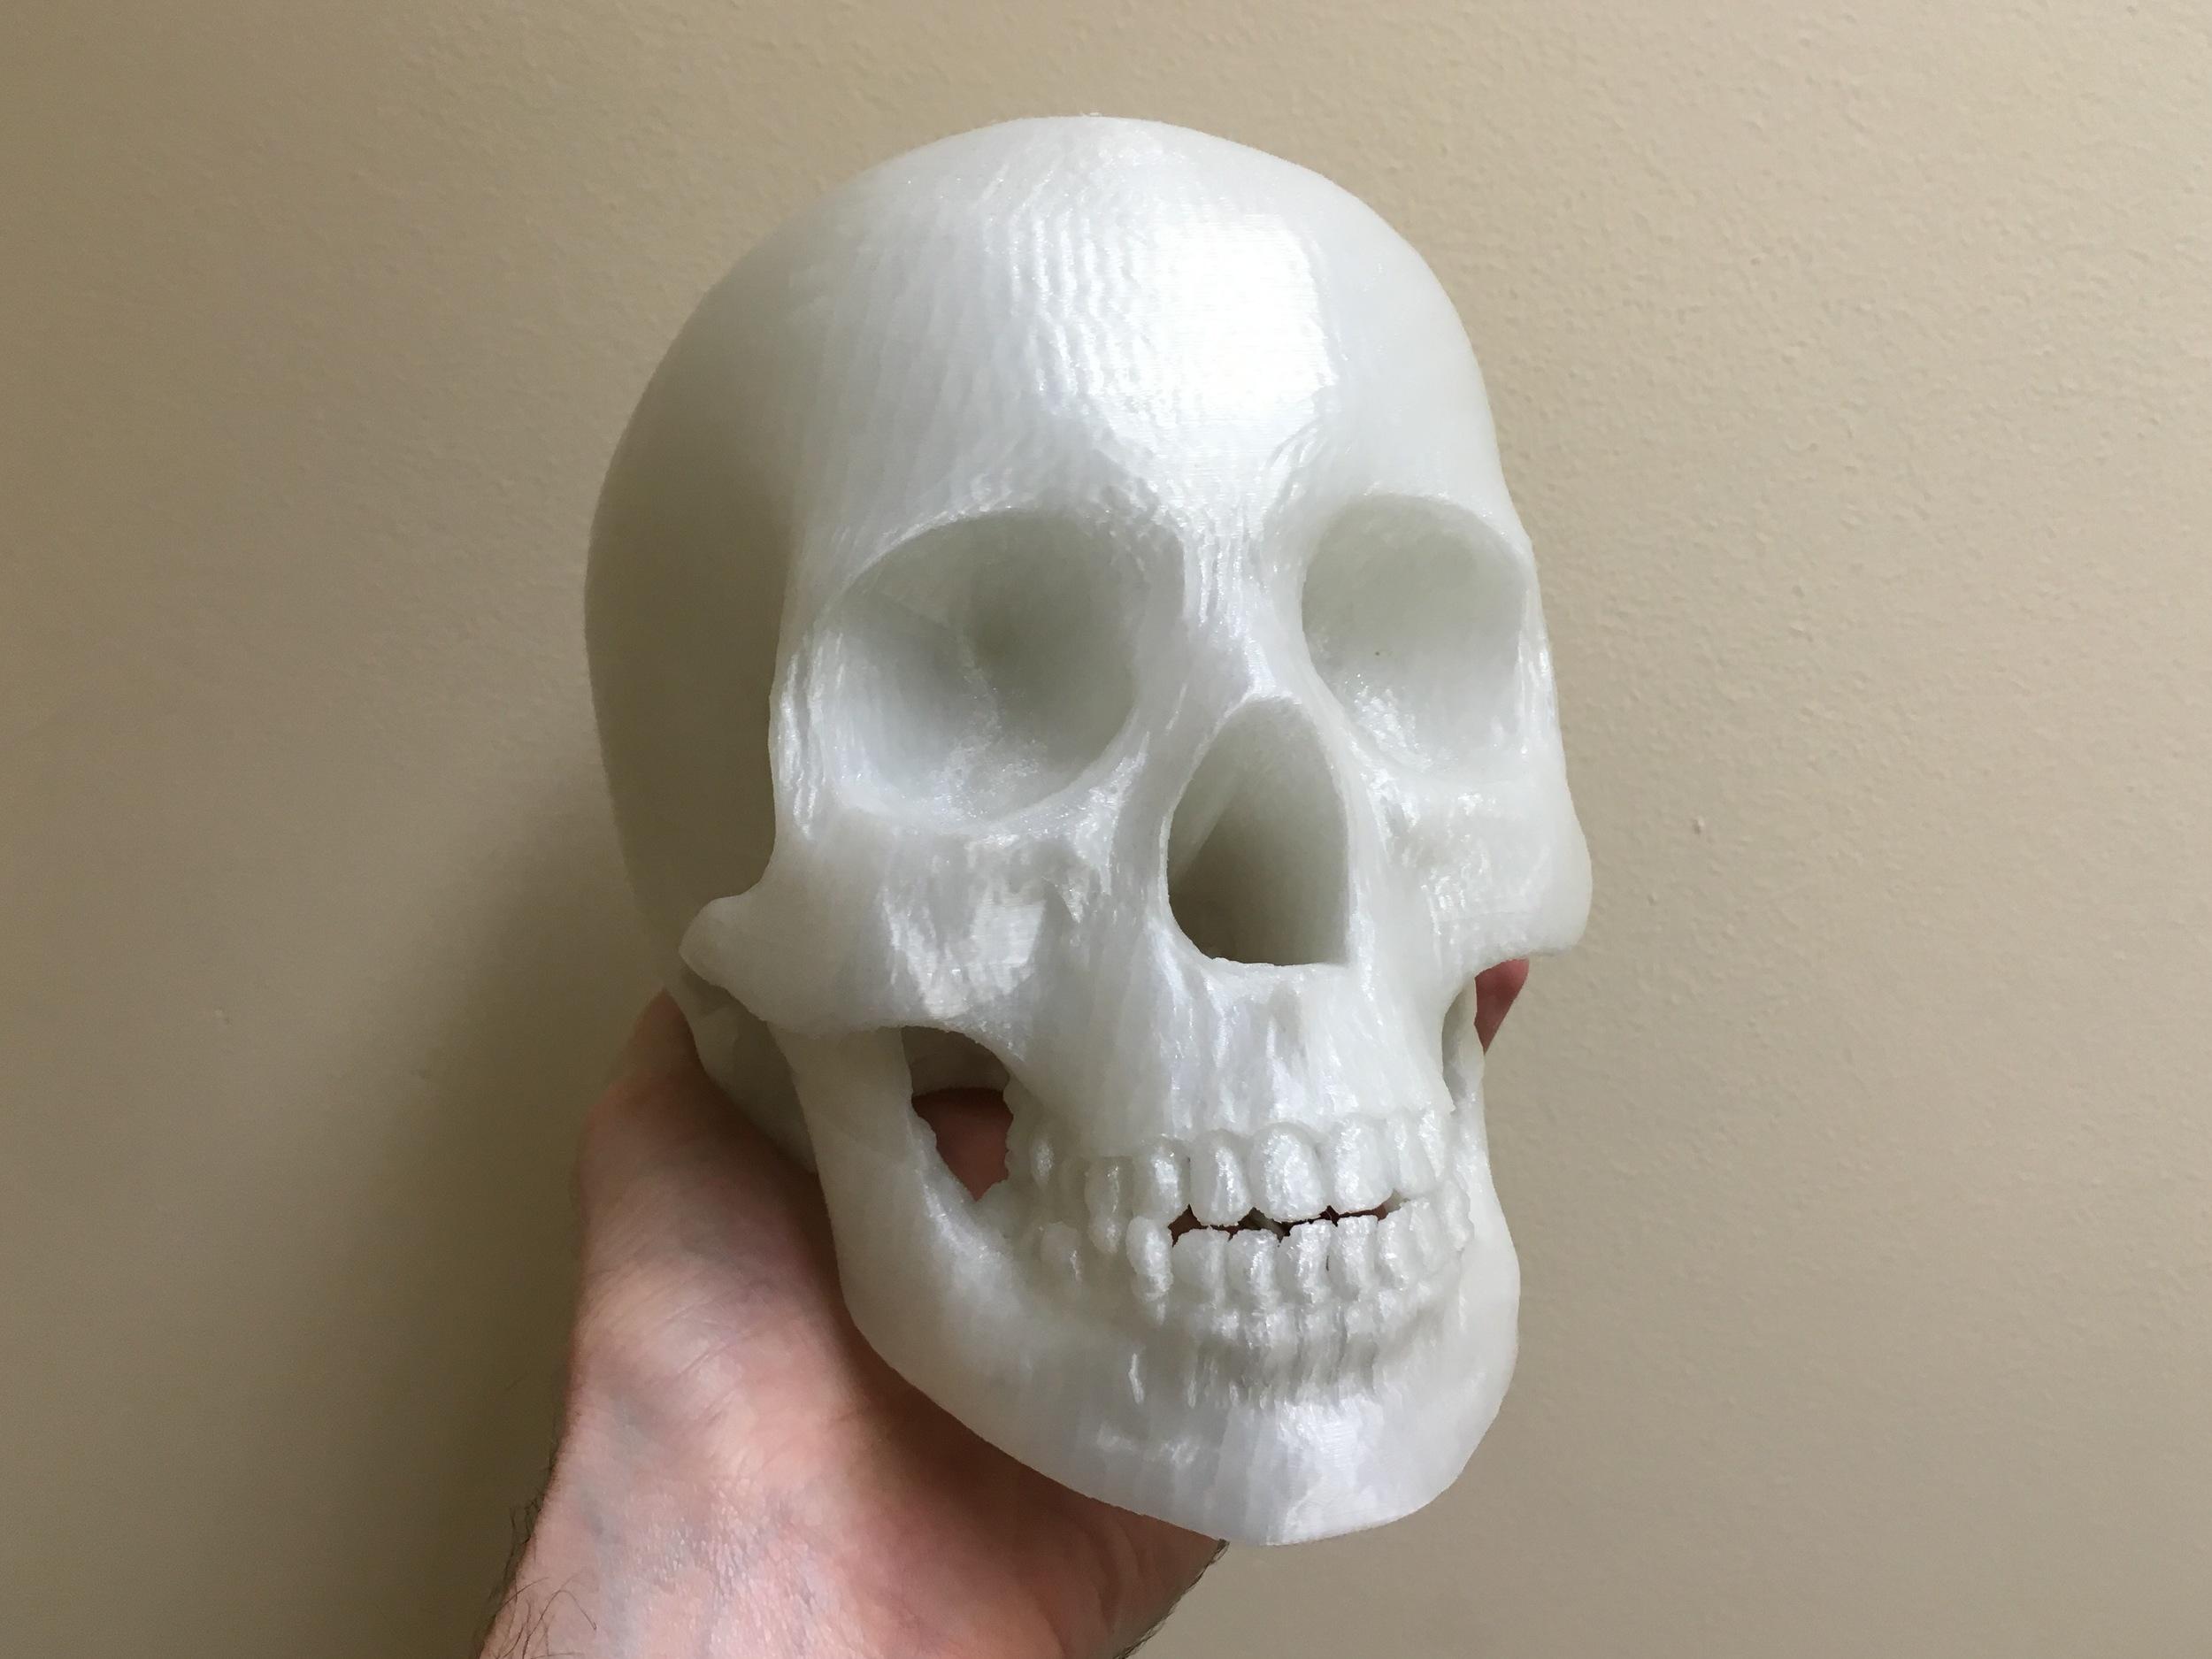 Life size 3D print of a human skull